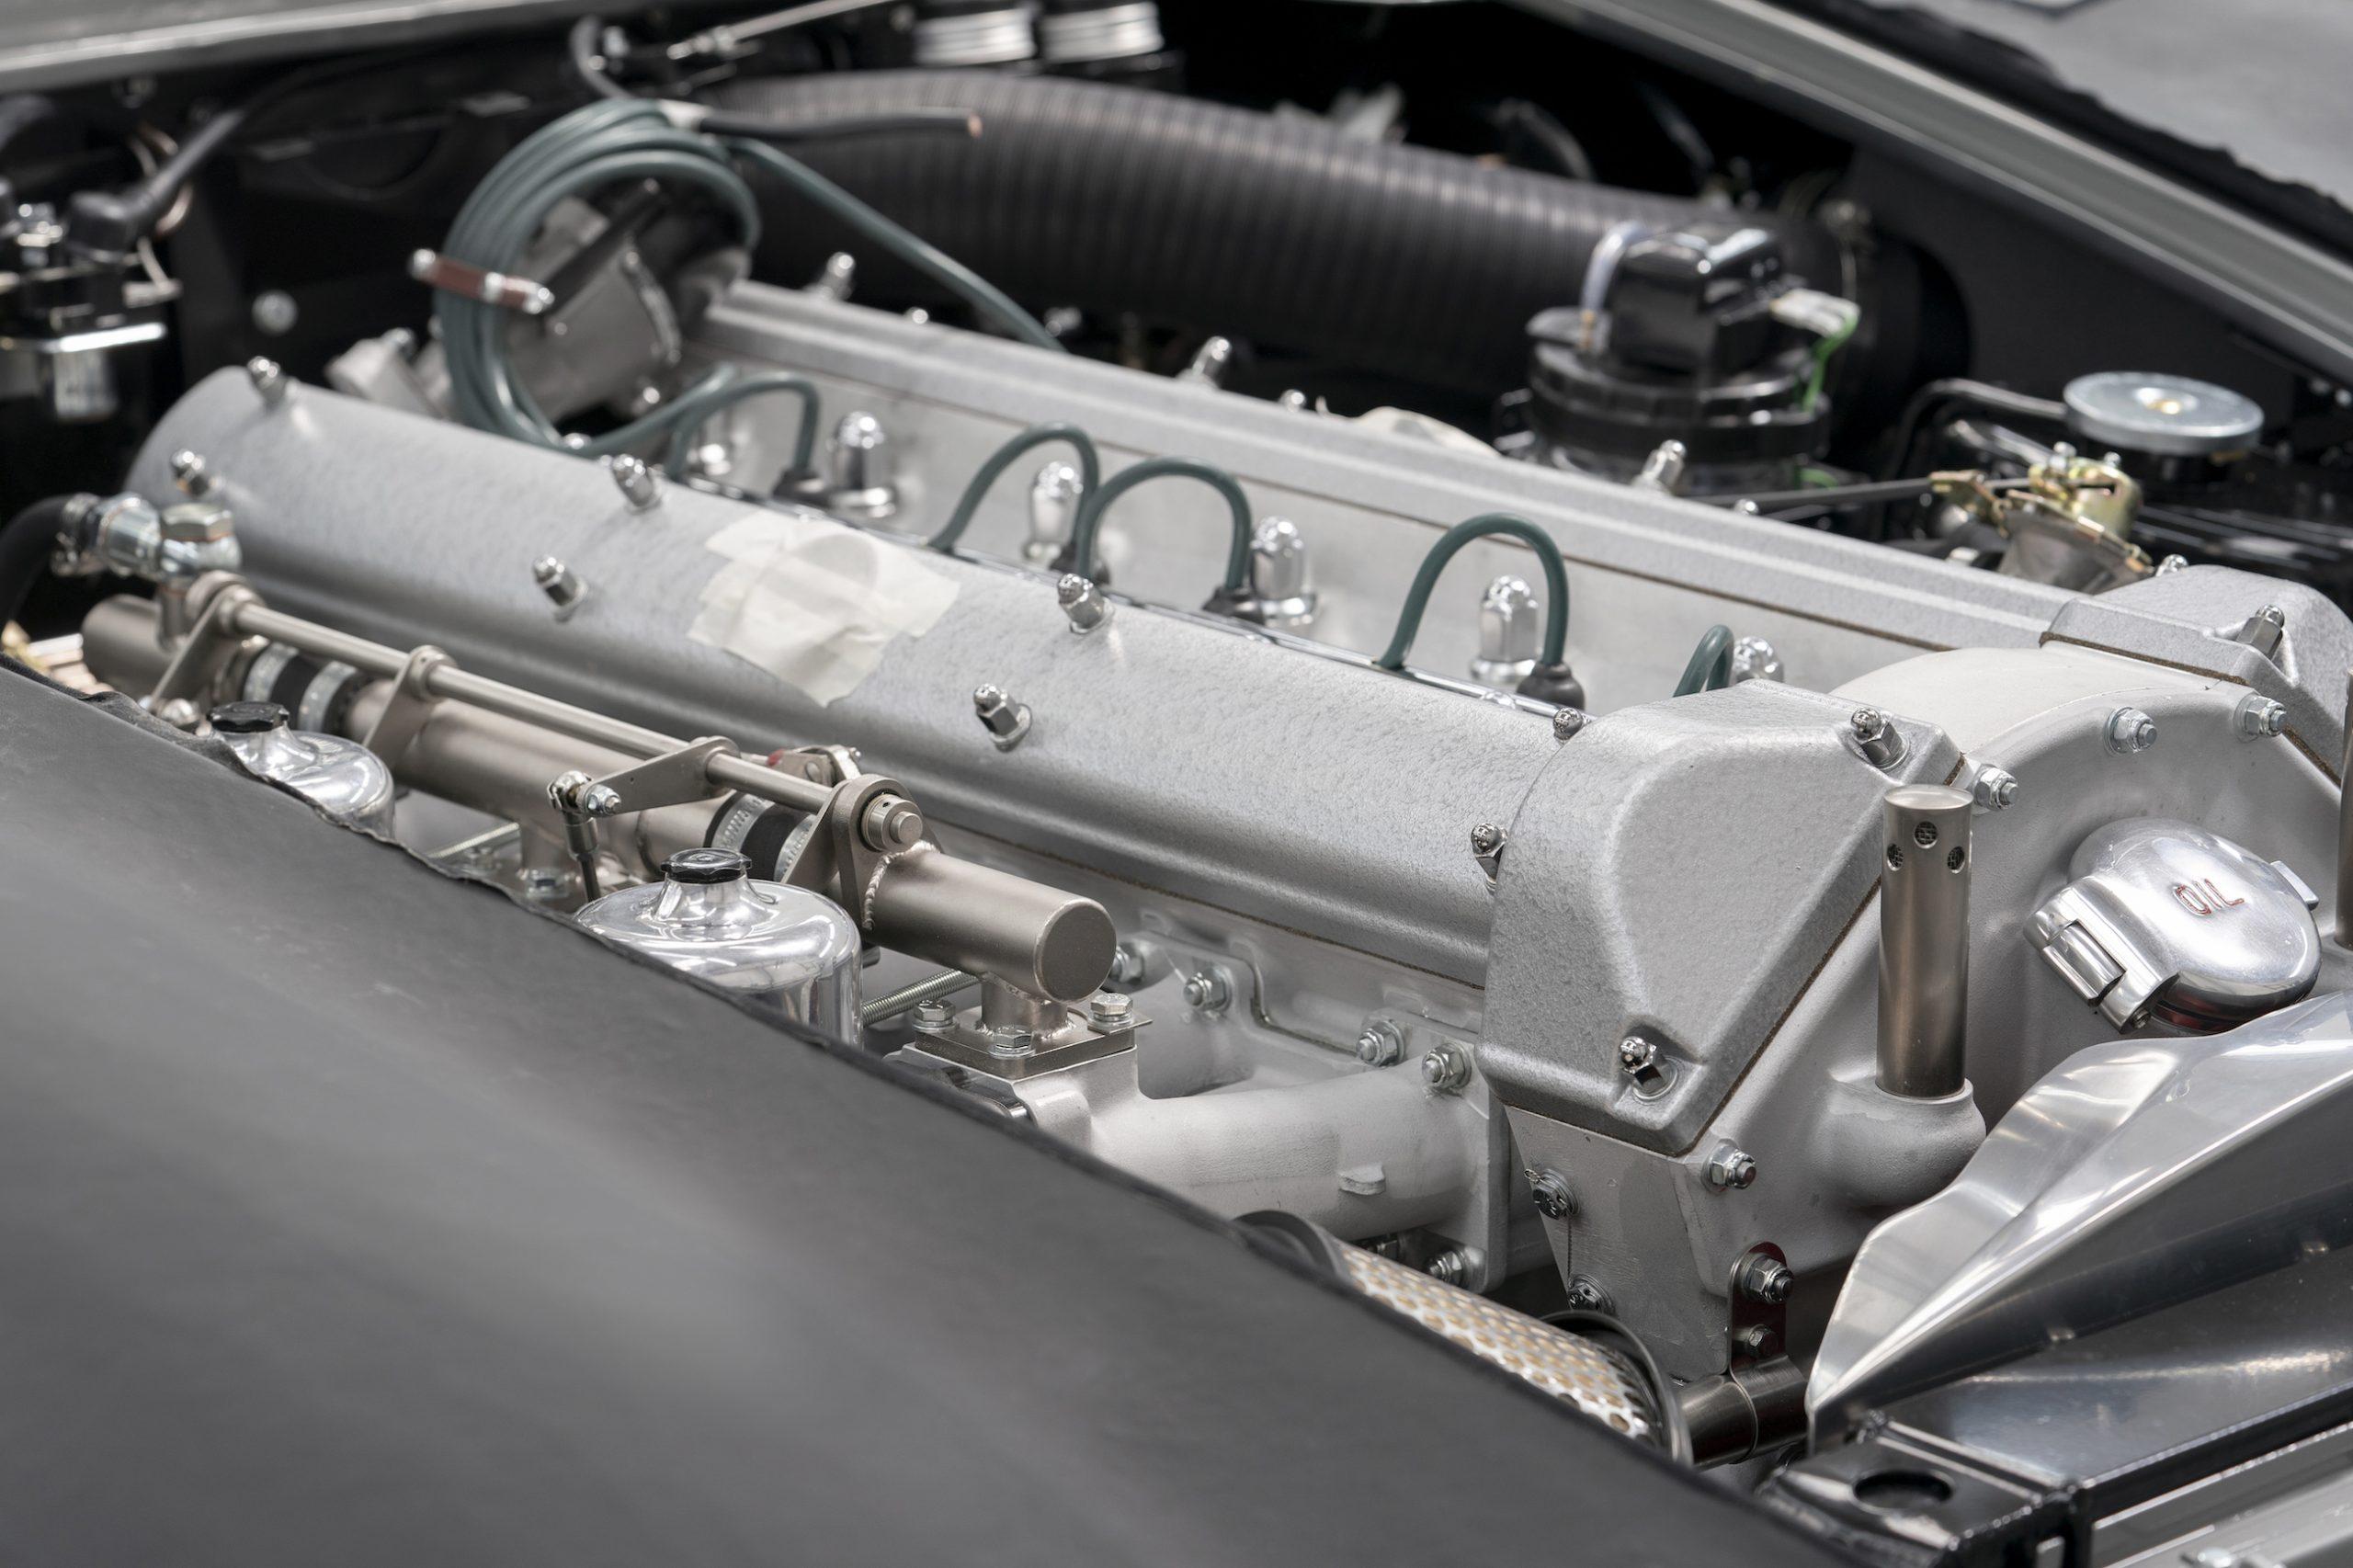 James Bond DB5 Goldfinger Engine Covers